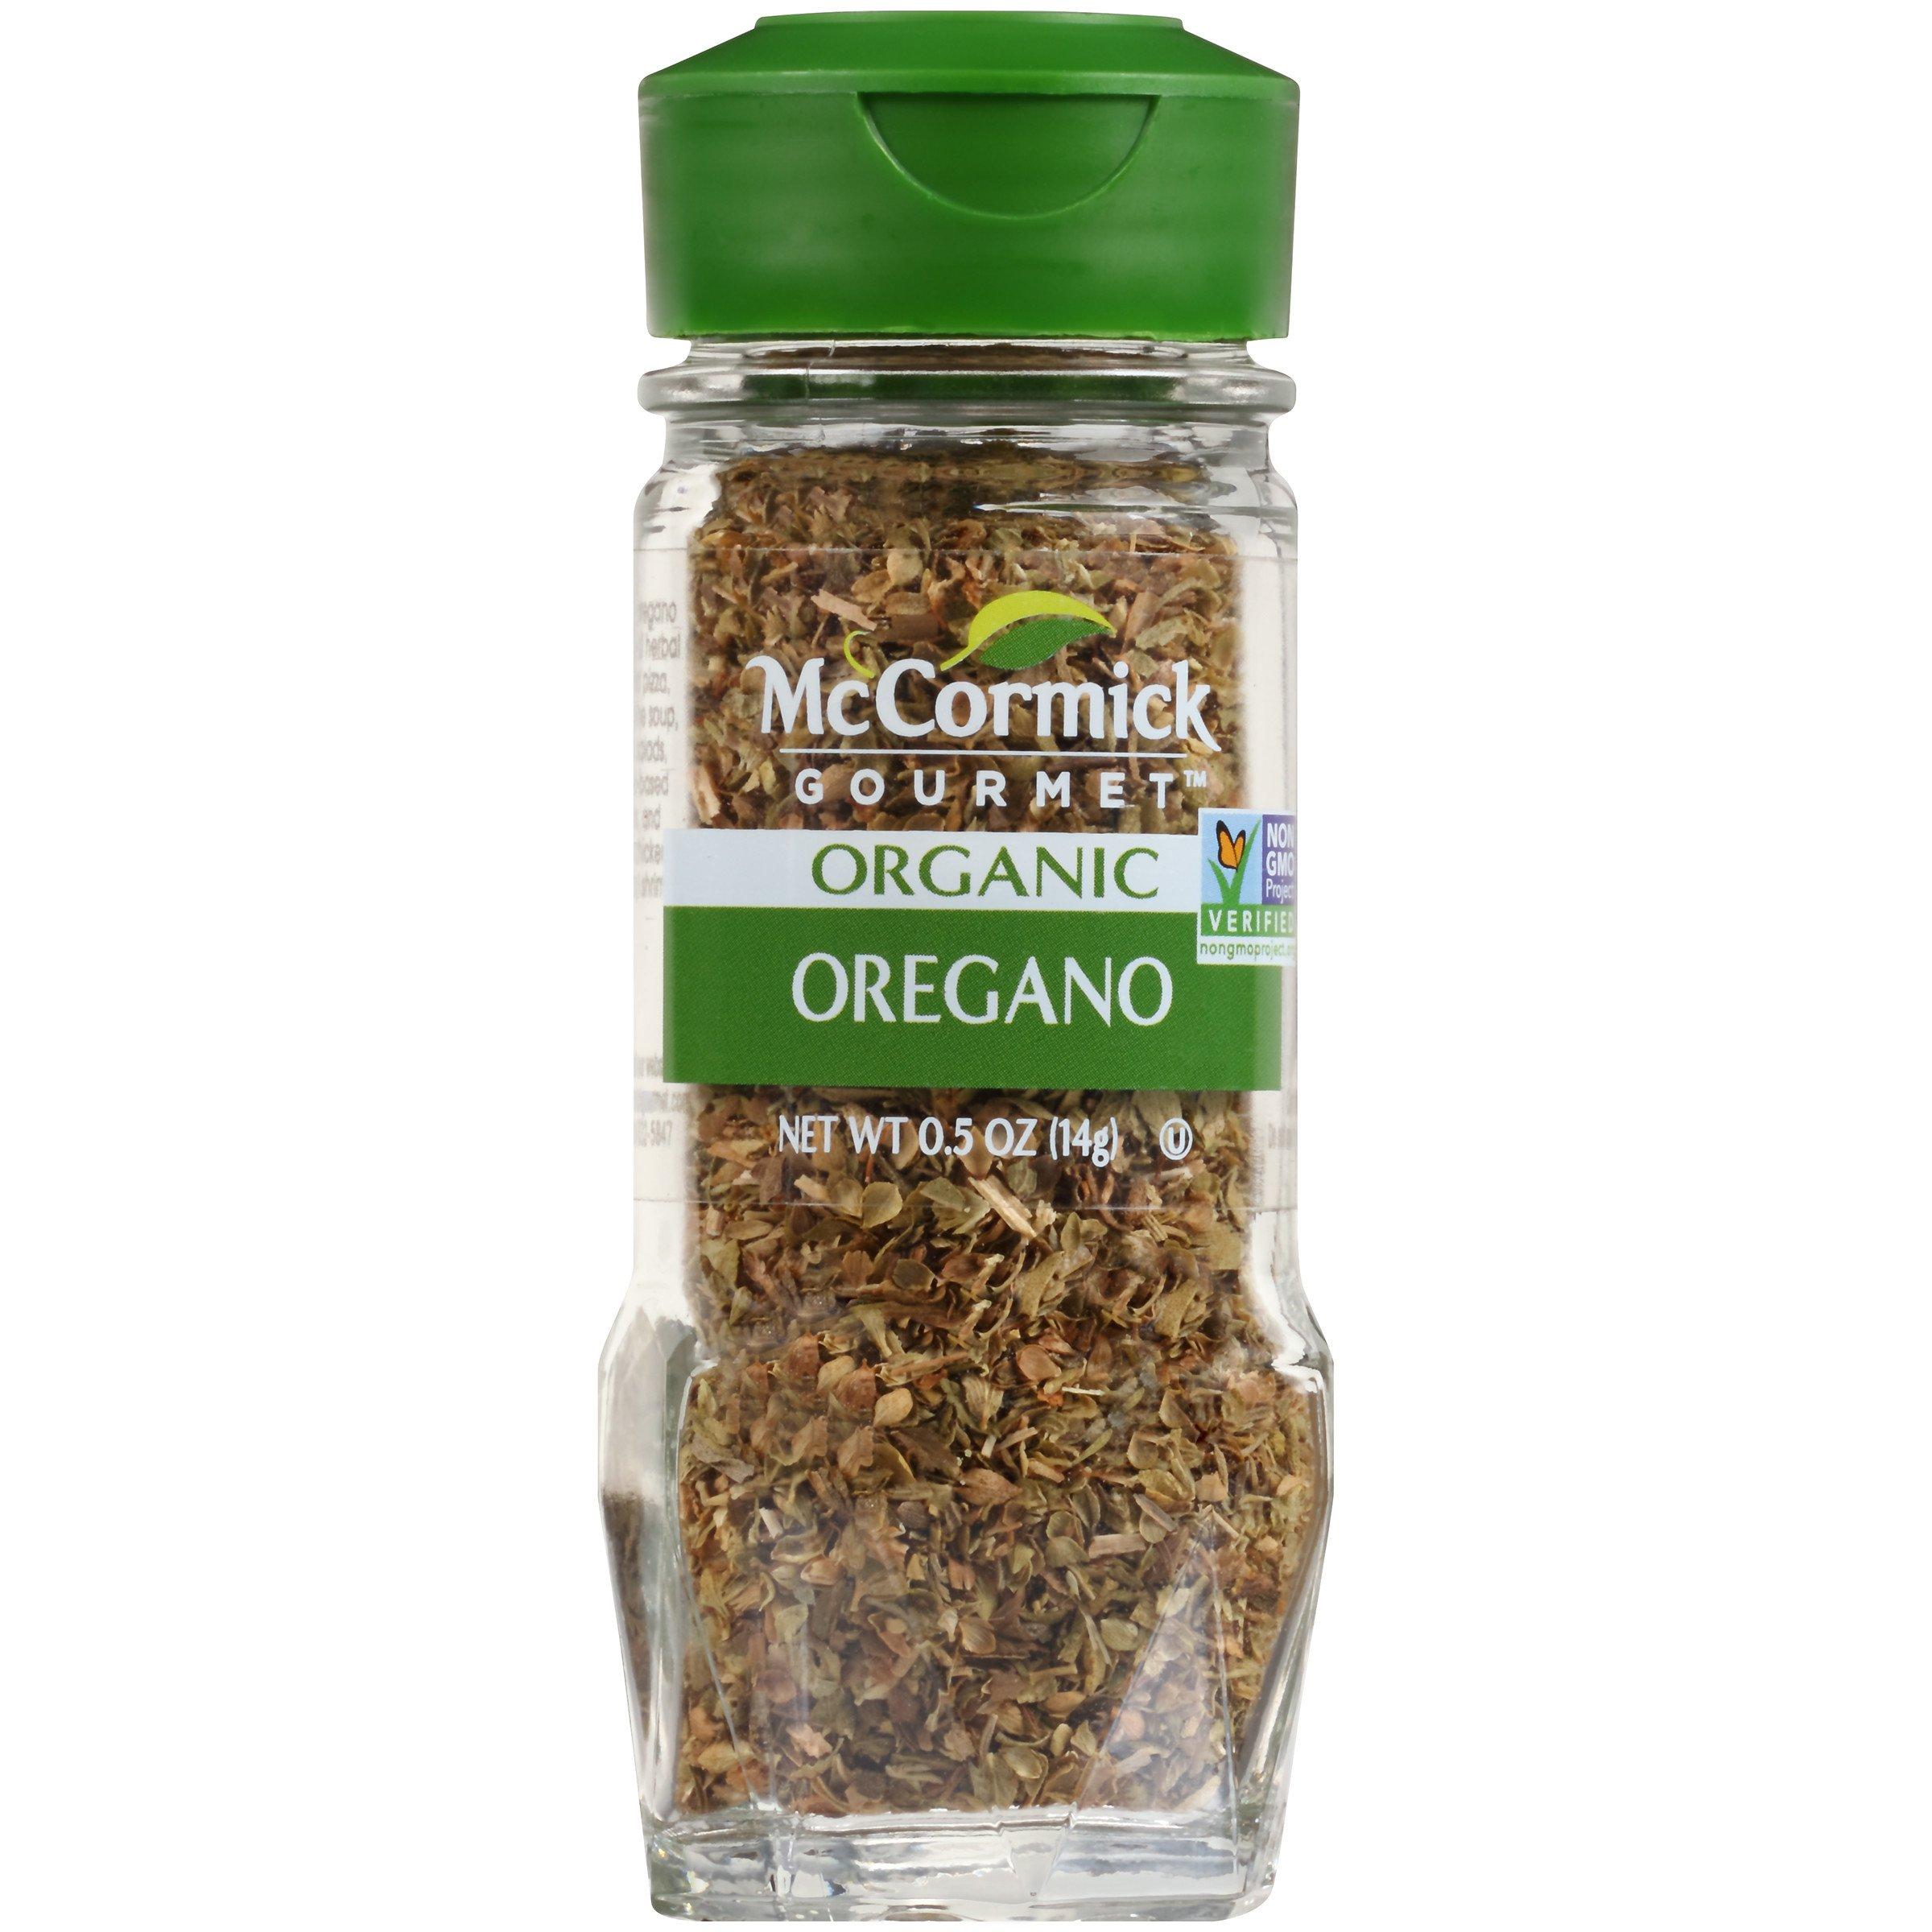 McCormick Gourmet Organic Oregano Leaves, 0.5 oz